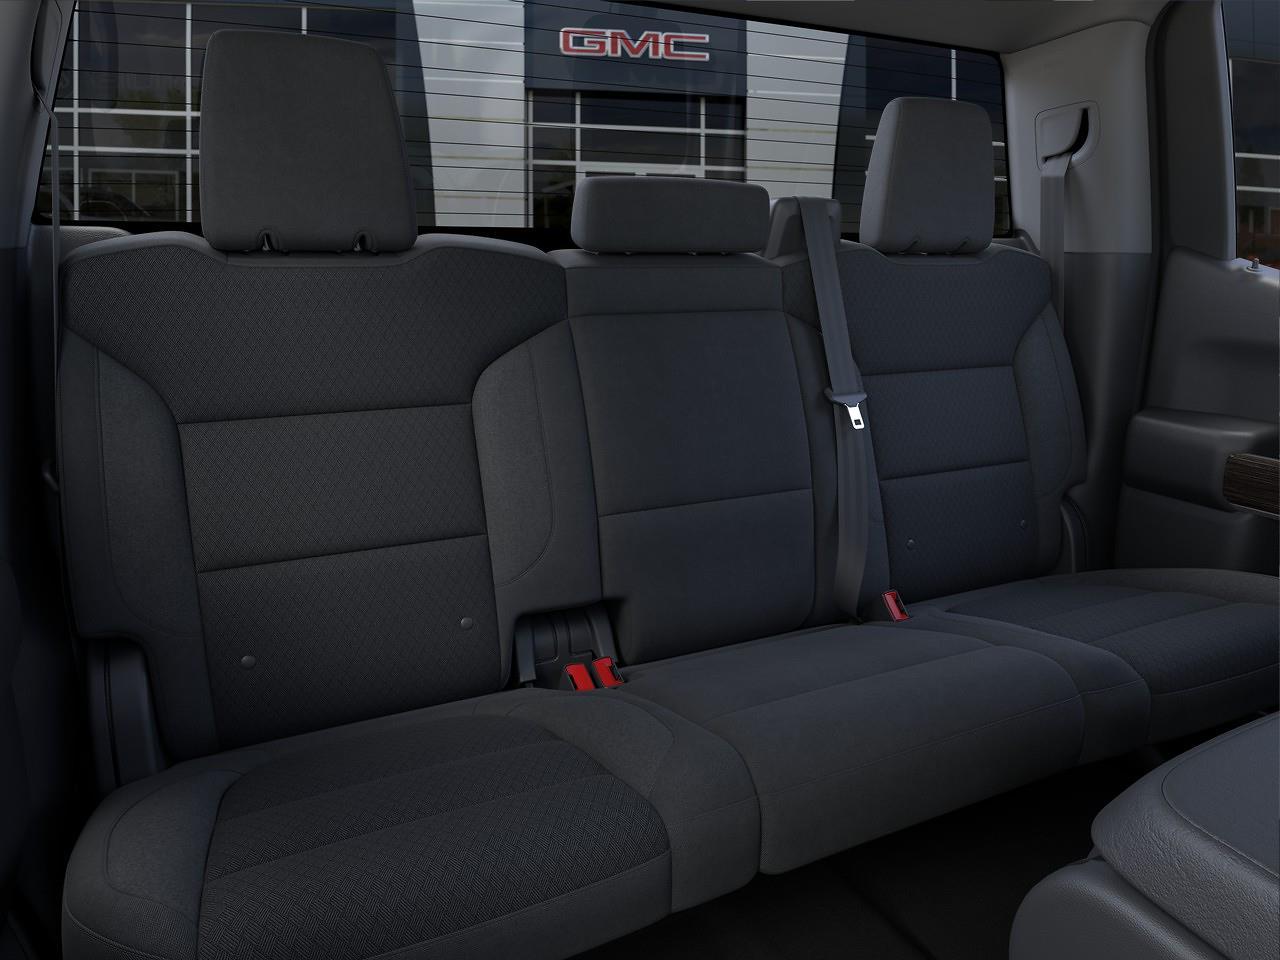 2021 GMC Sierra 1500 Double Cab 4x4, Pickup #416068 - photo 14